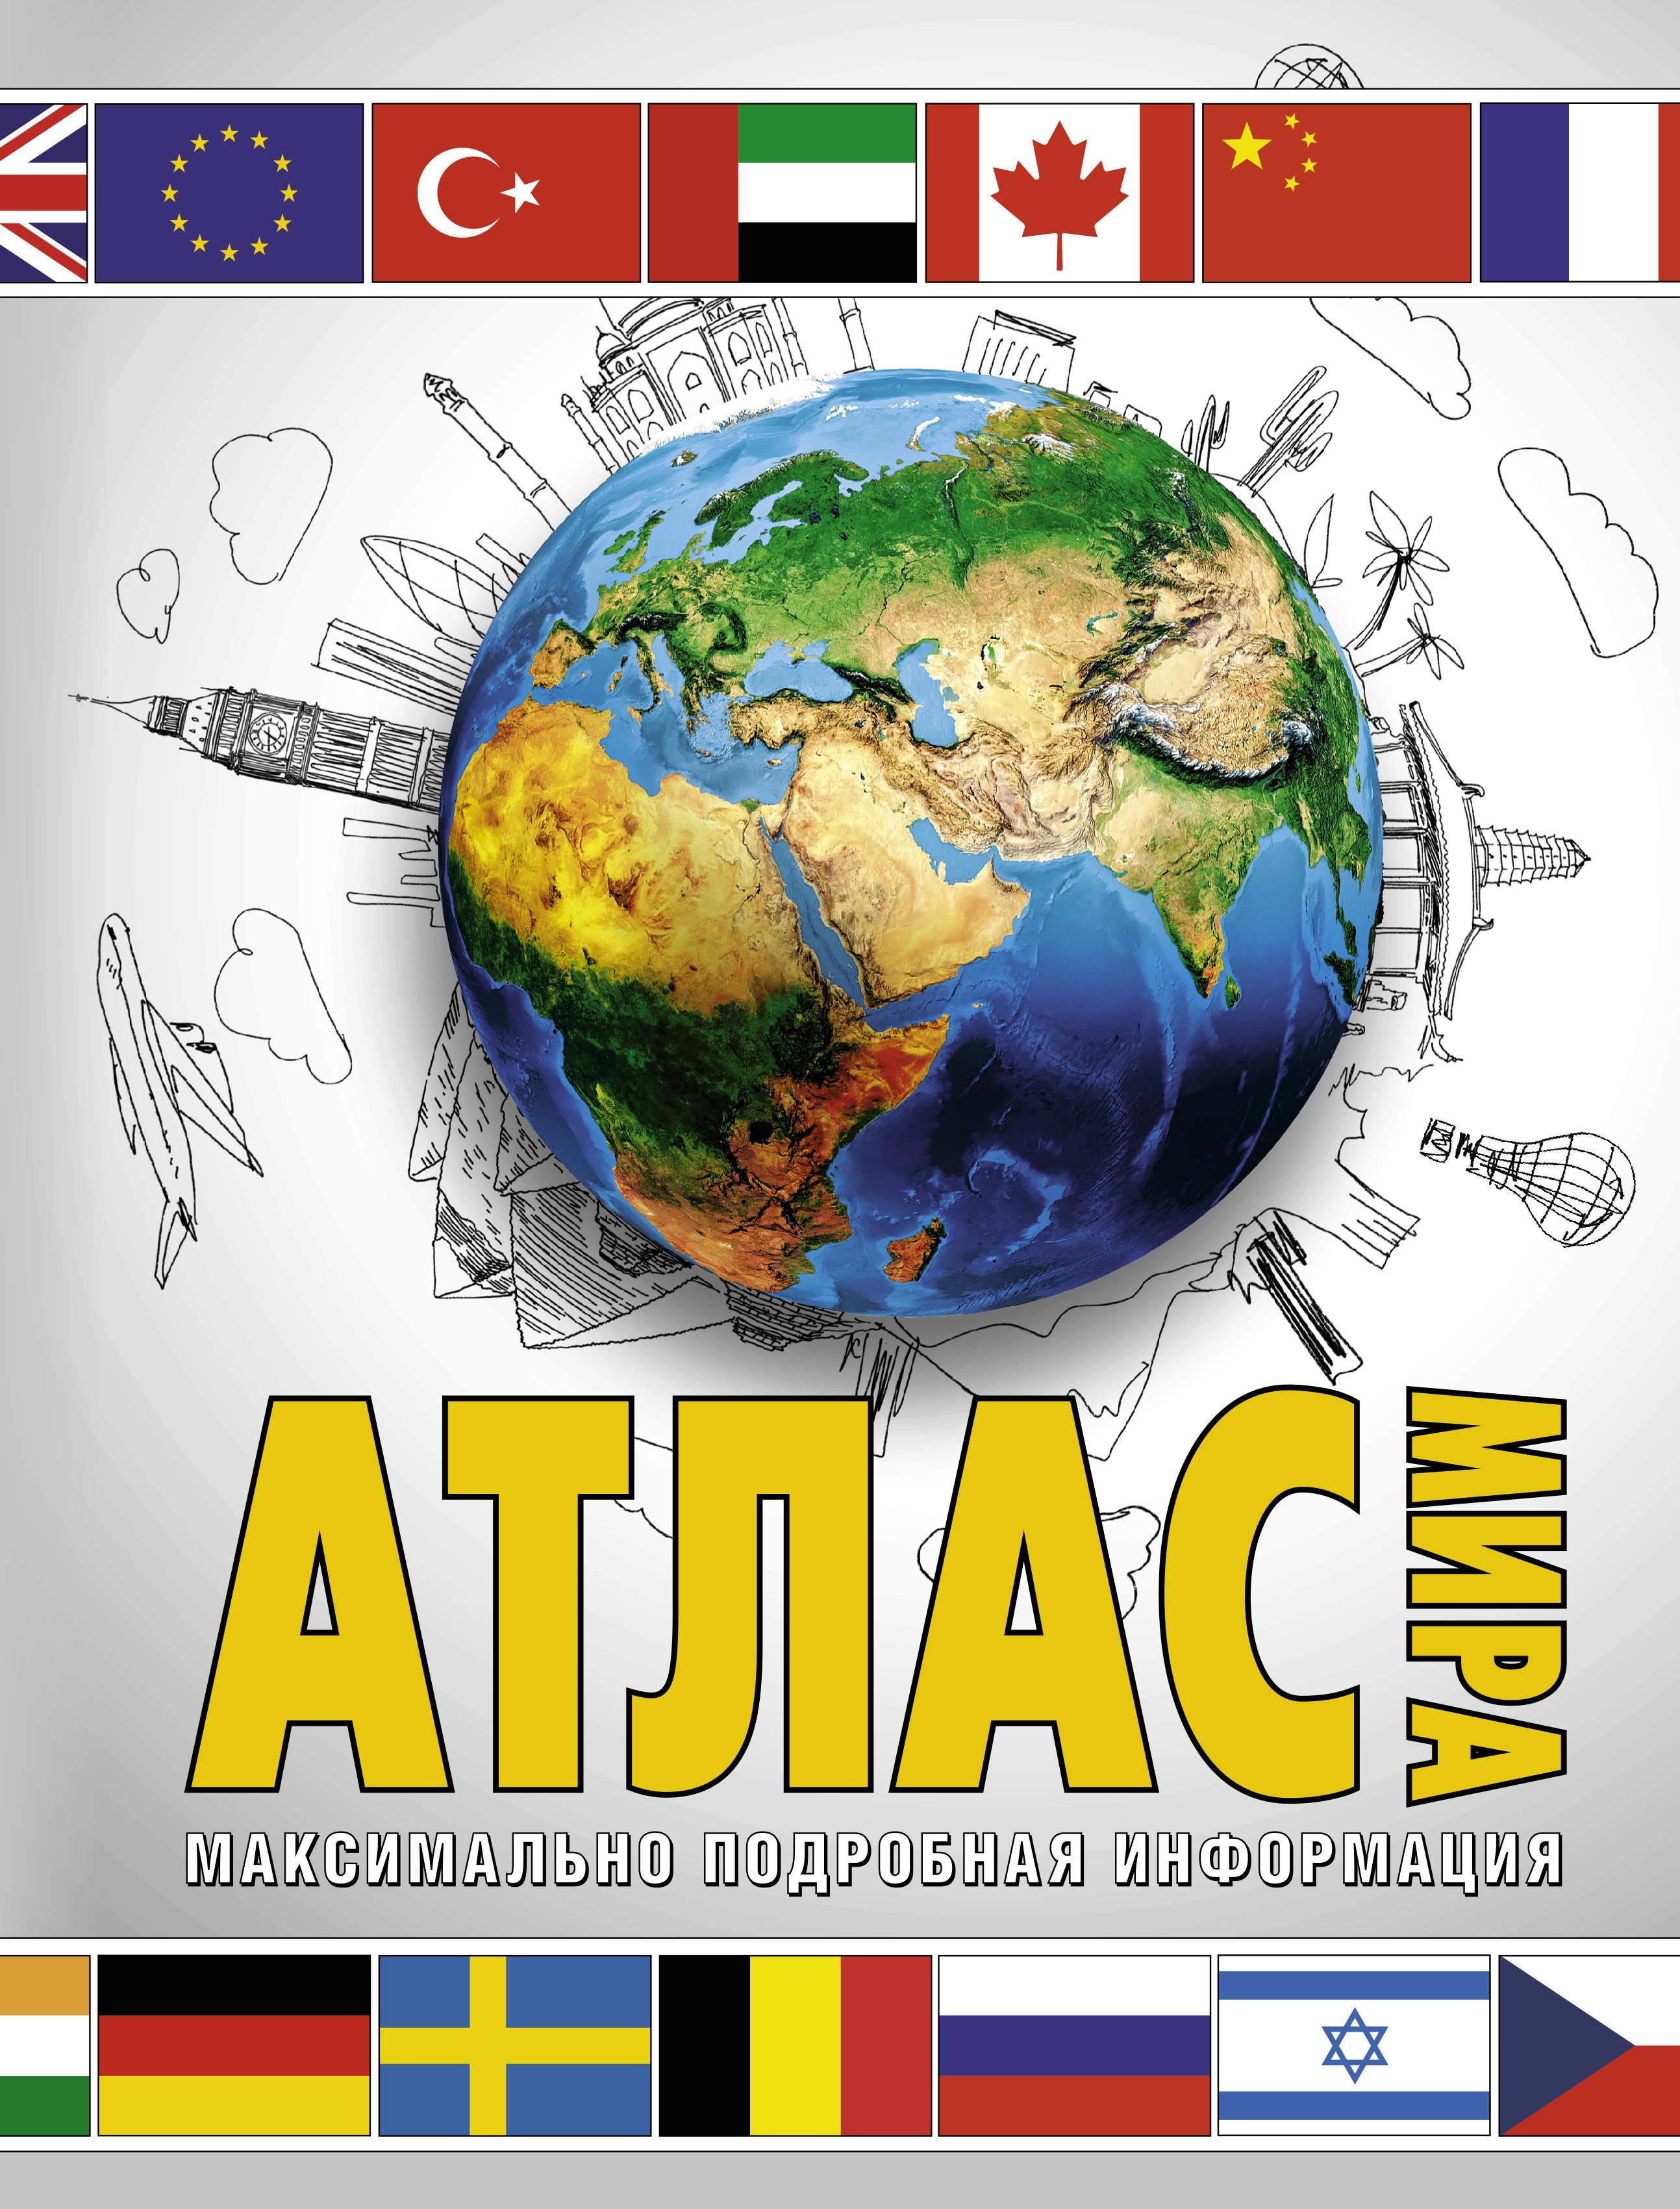 Atlas mira. Maksimalno podrobnaja informatsija (bel.)